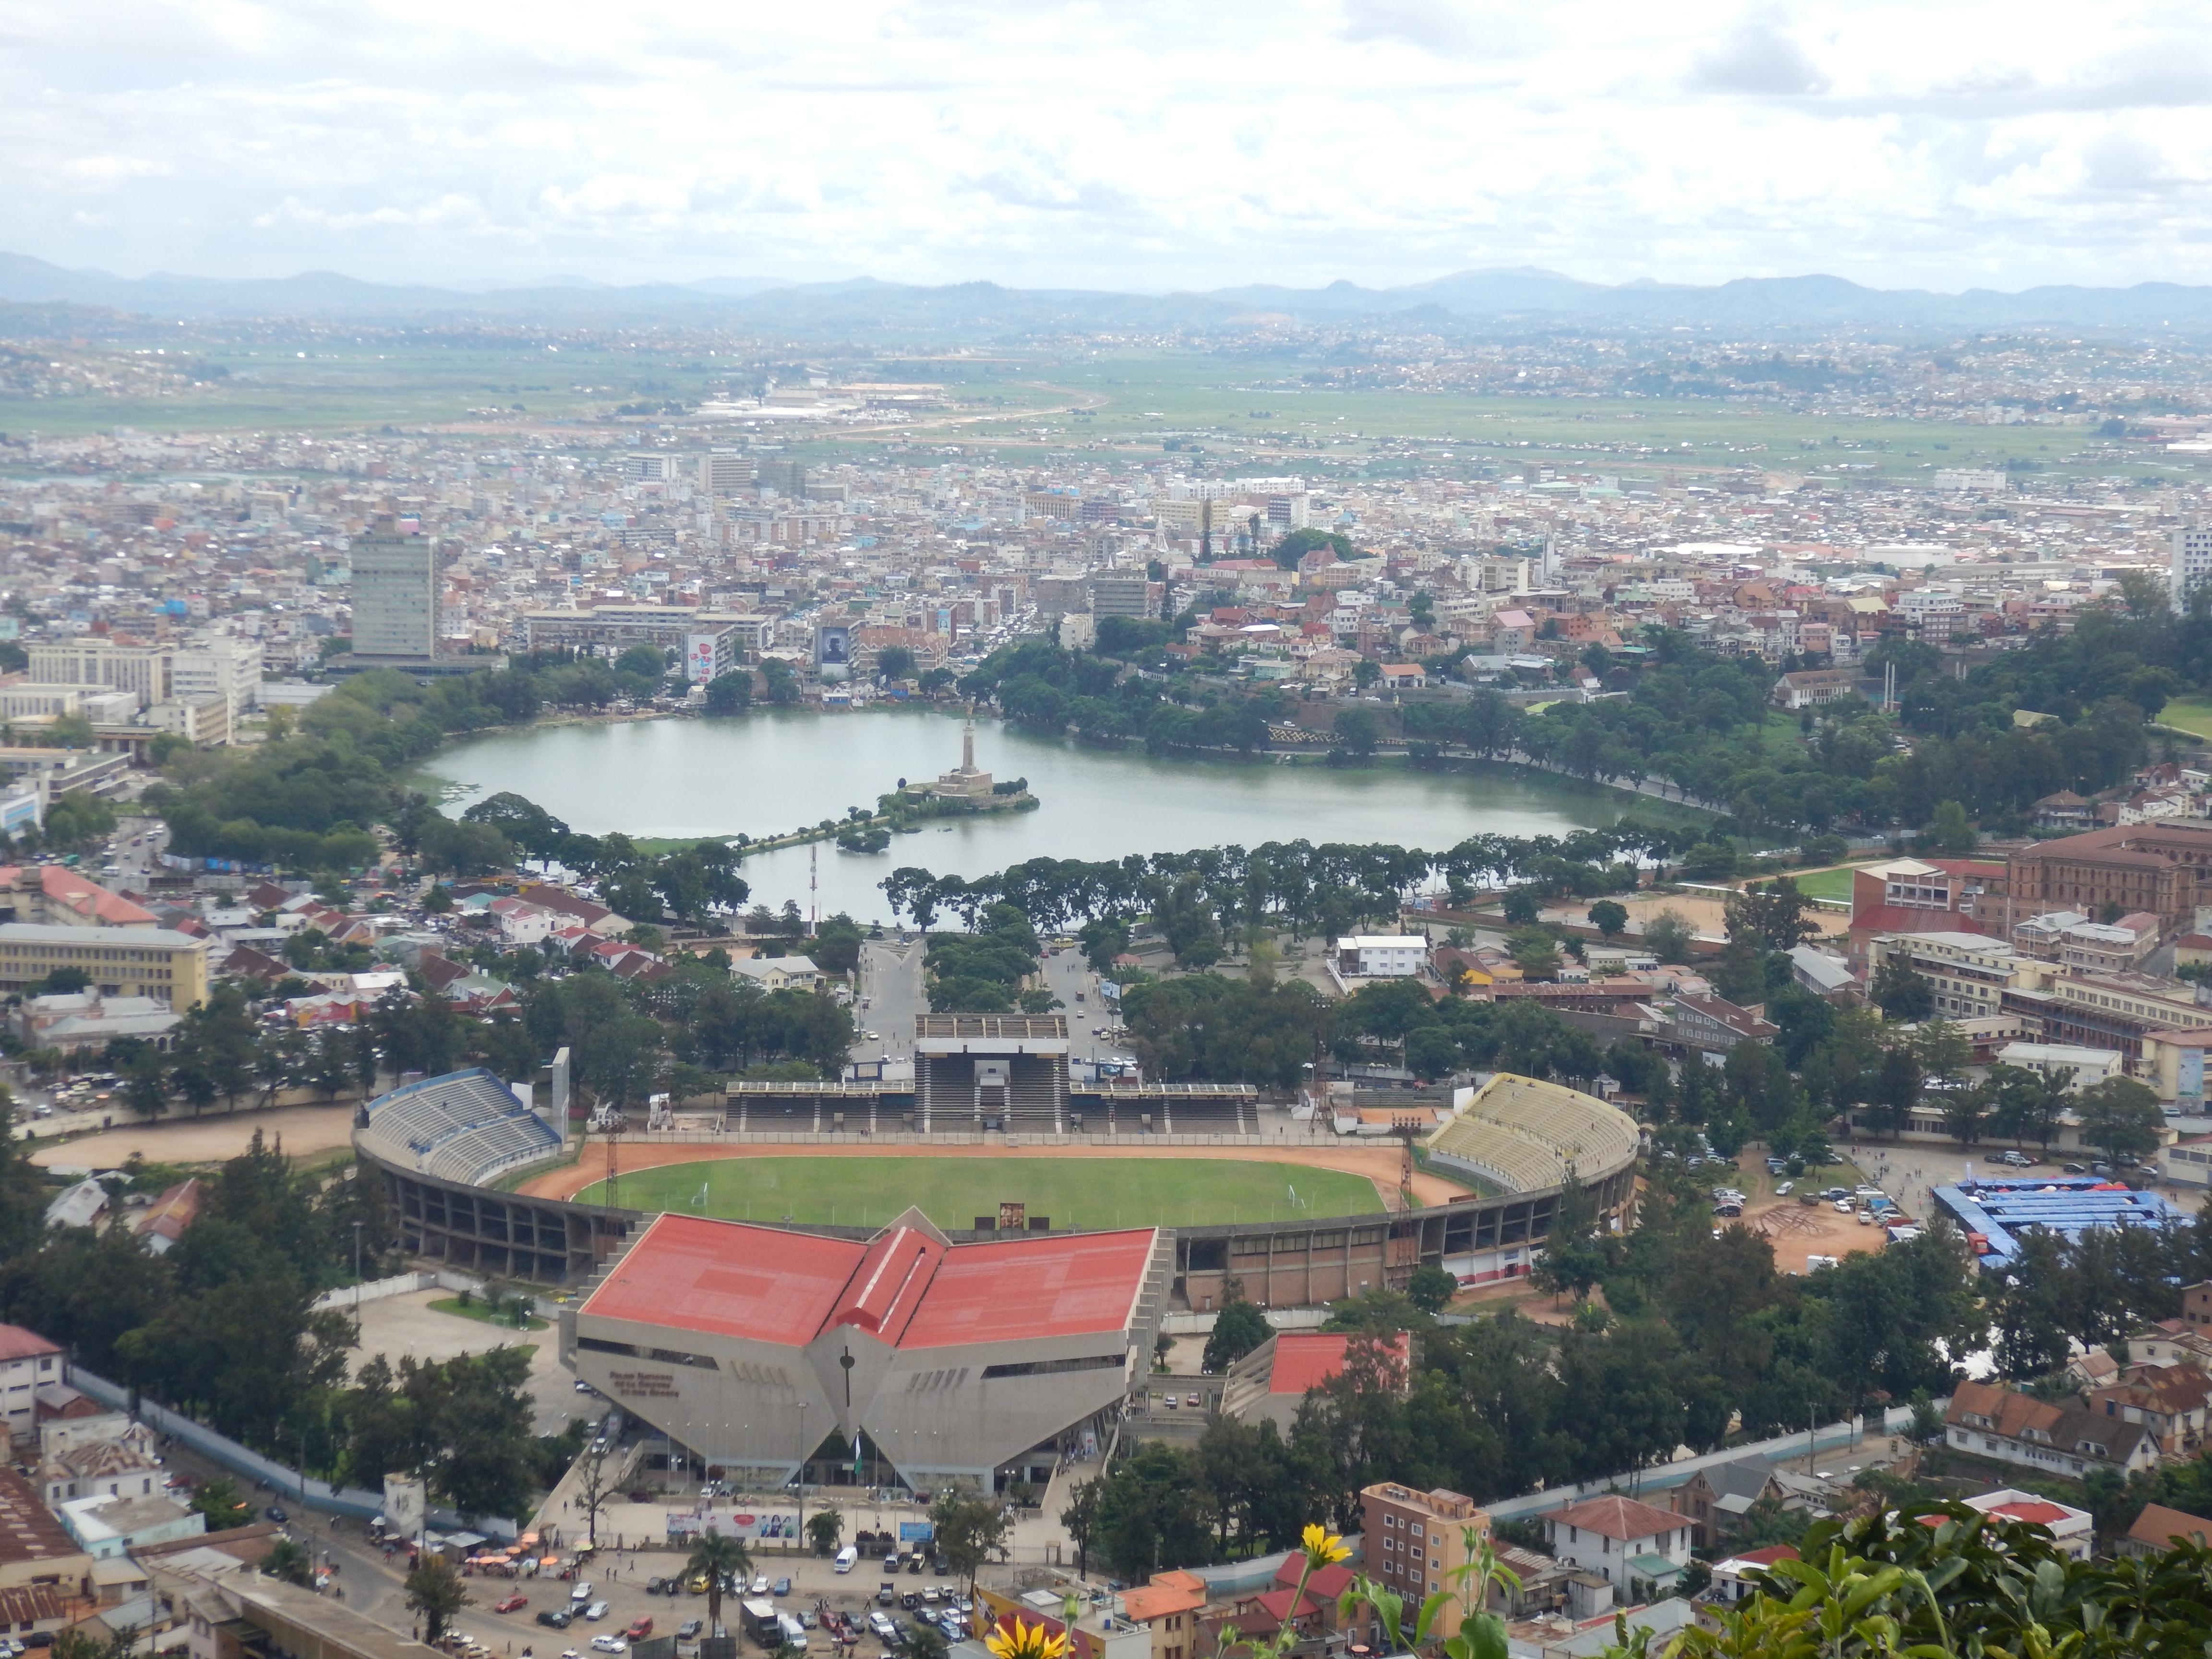 Der herzförmige Anosi See in Antananarivo